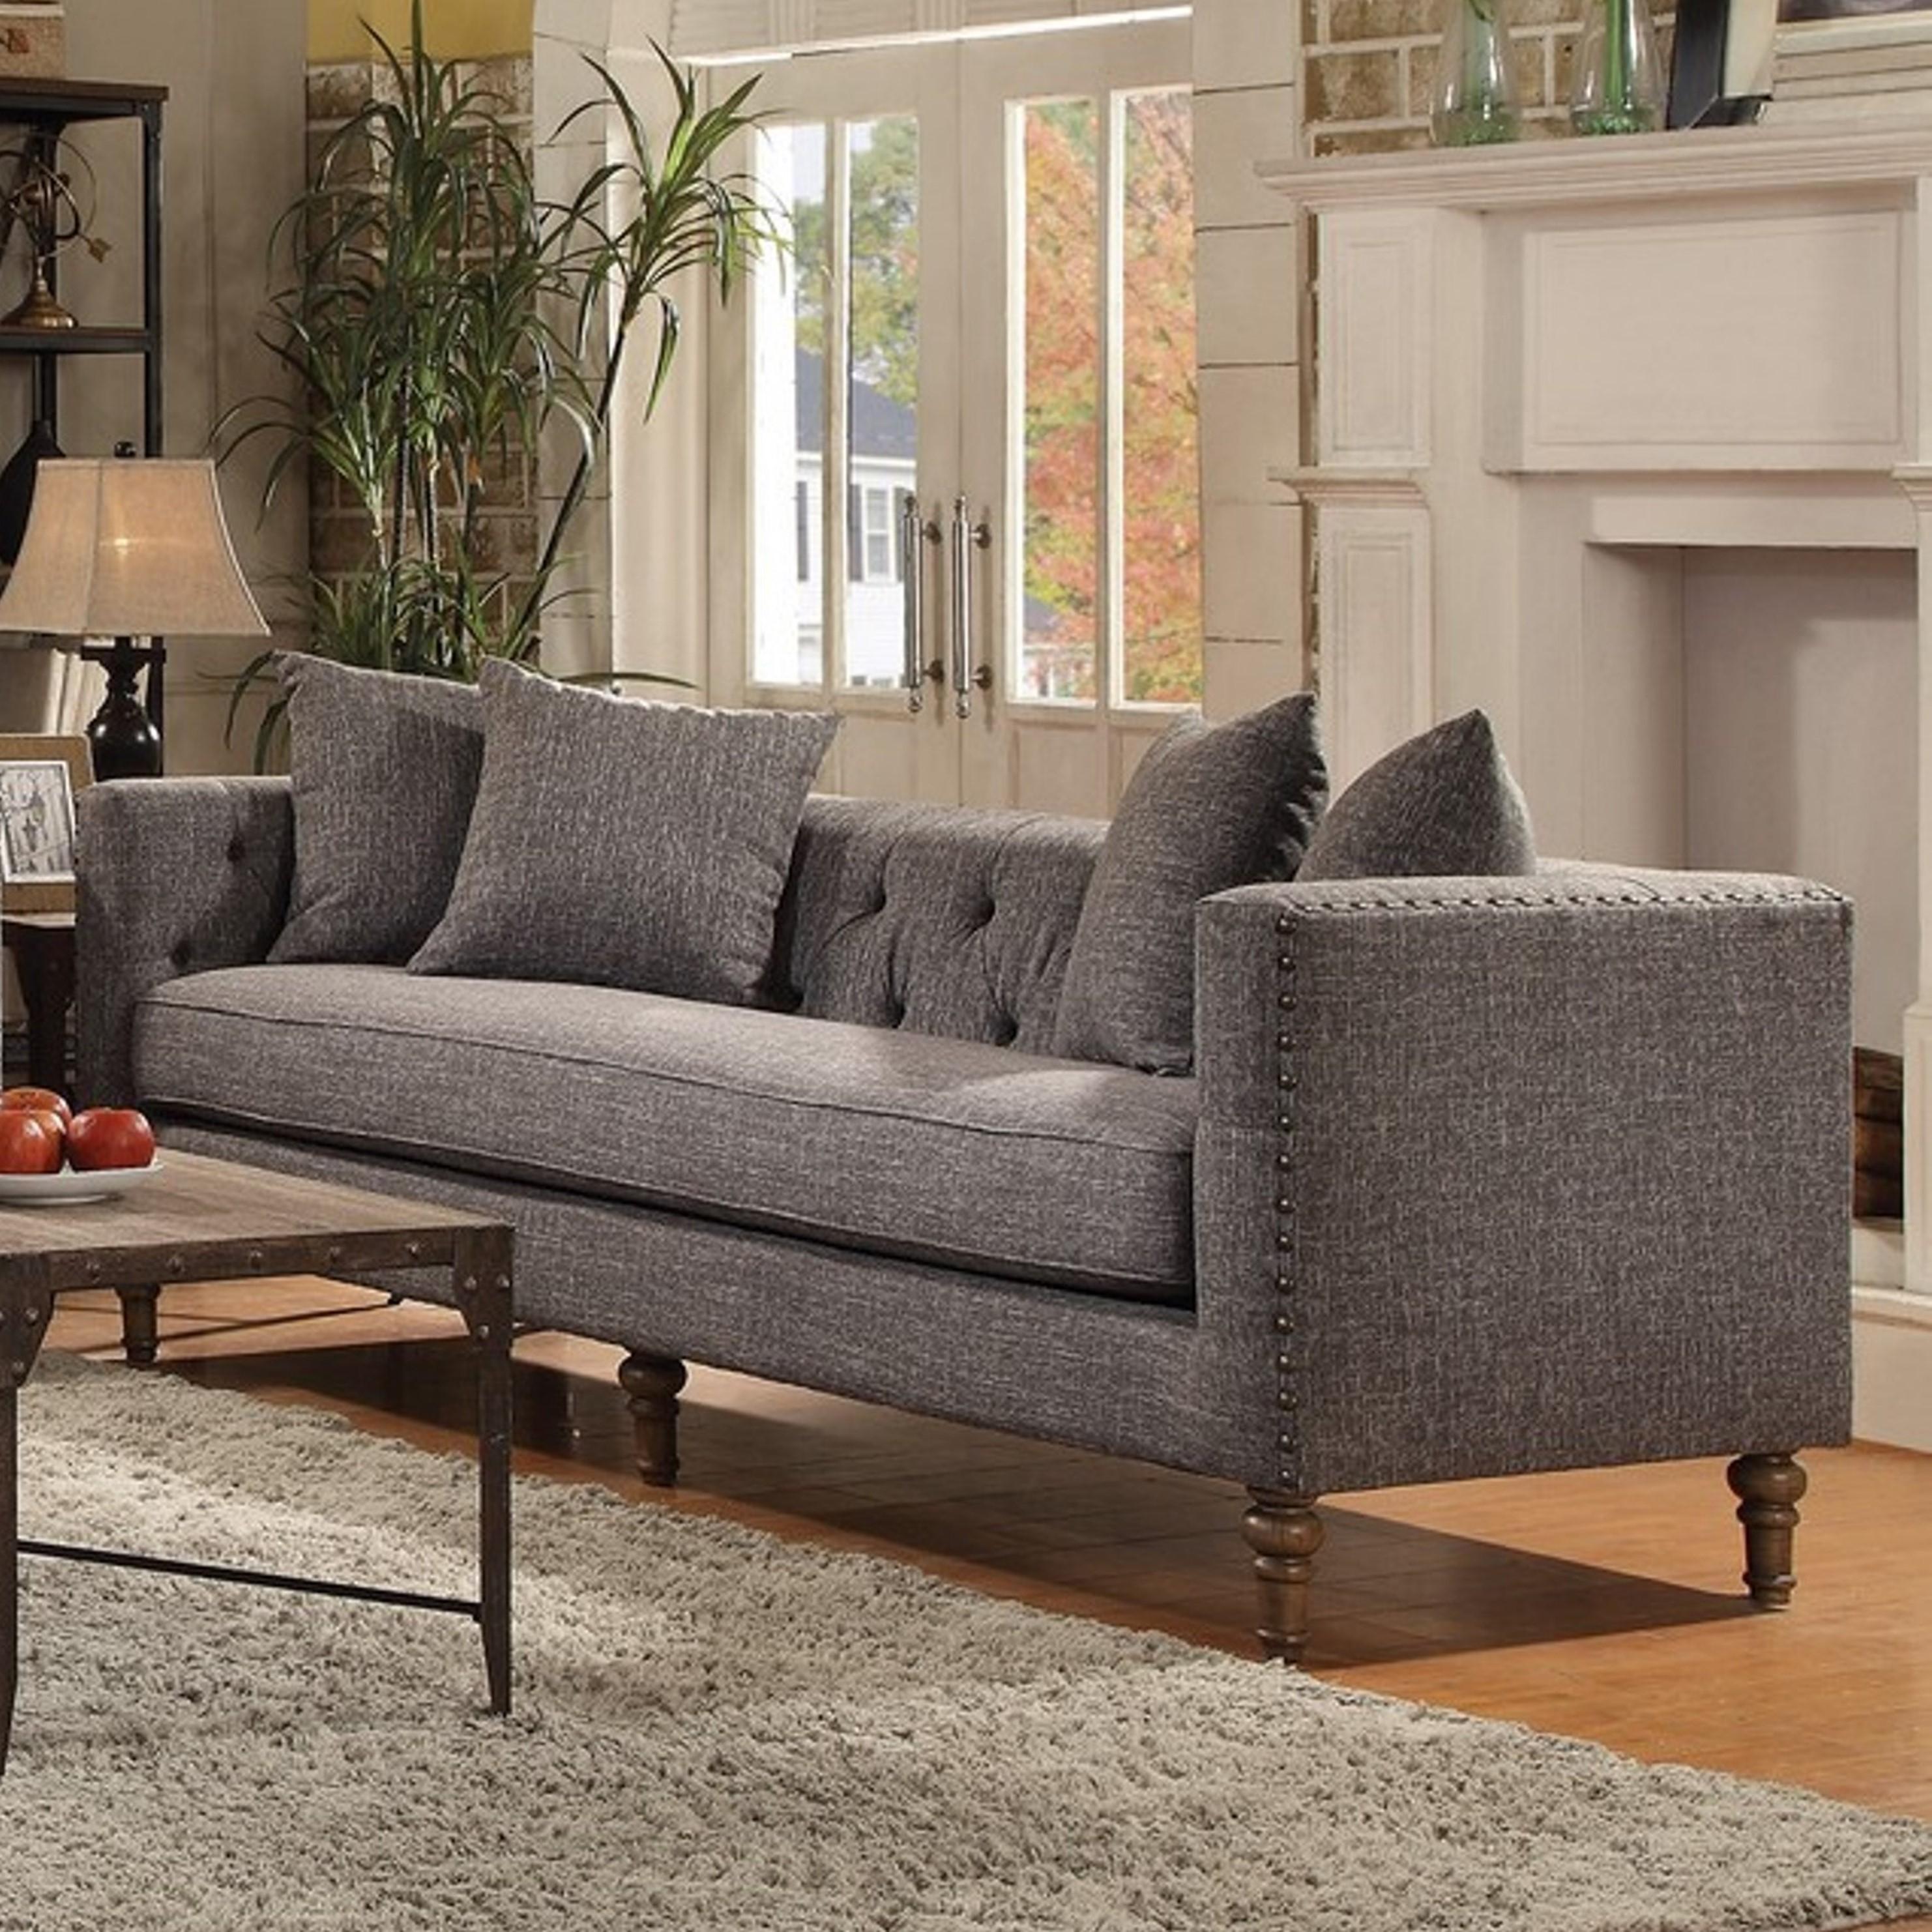 Shop Exquisite Traditional Tufted Tuxedo Back Design Living Room ...